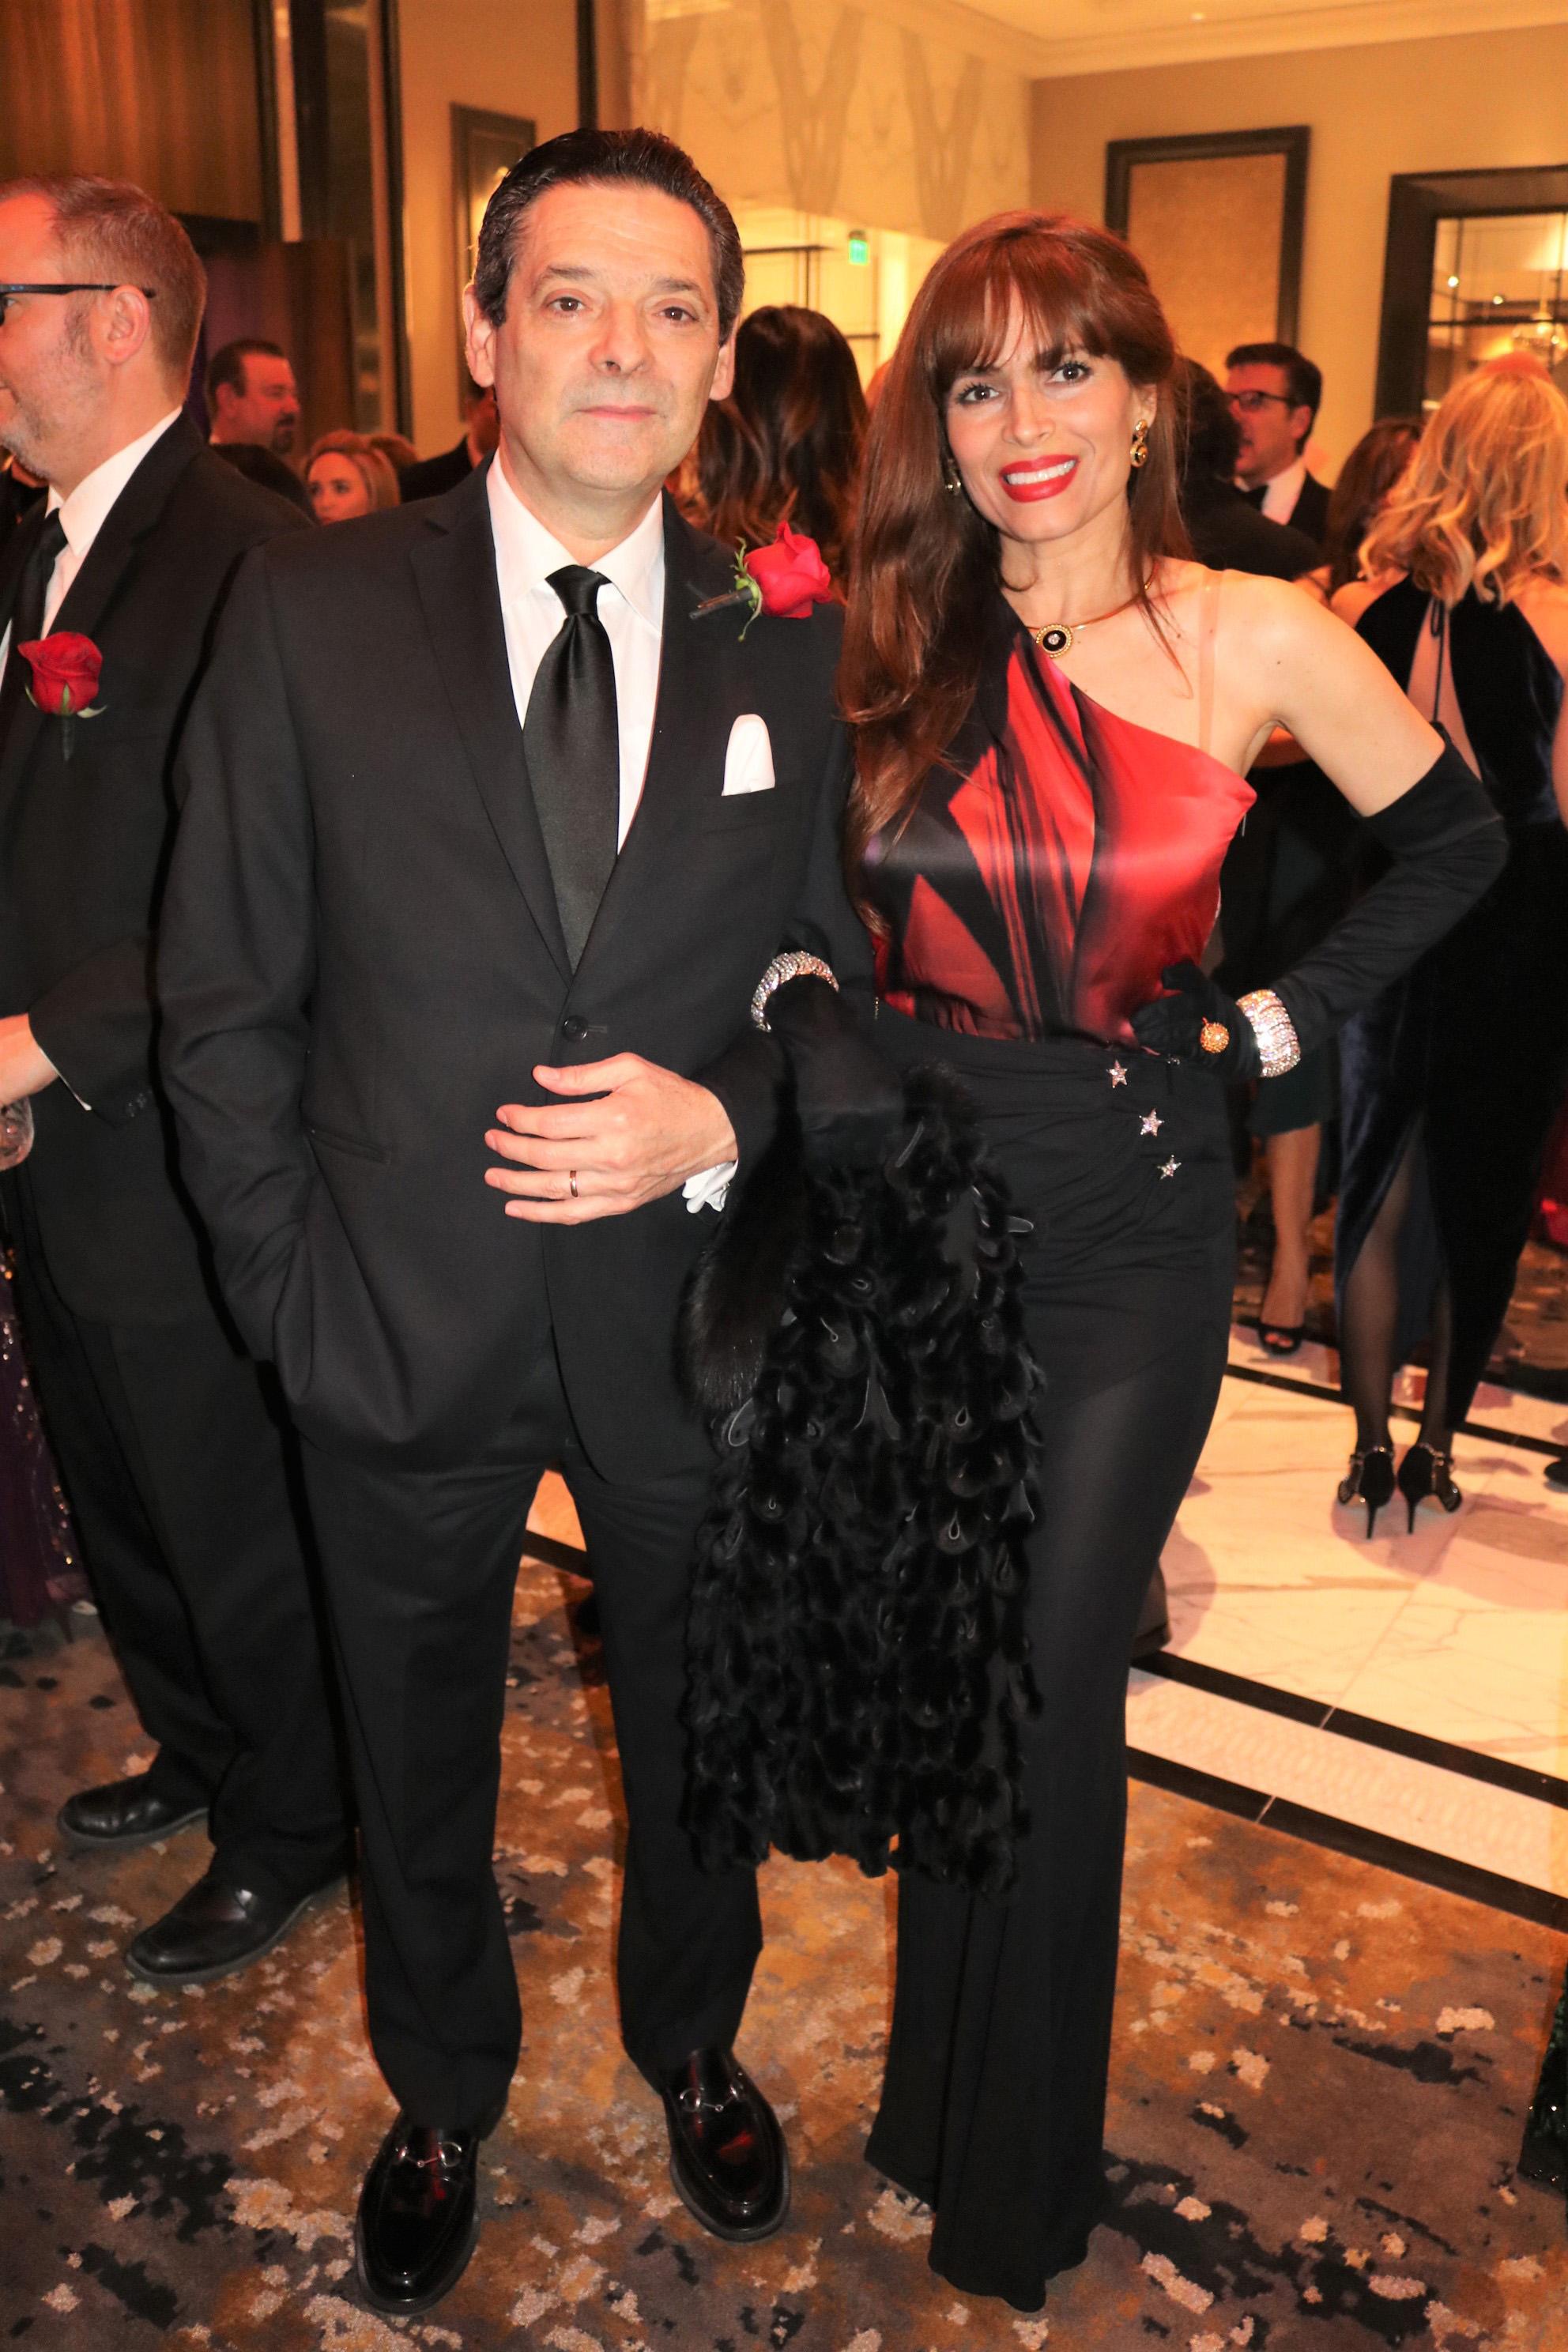 Carlos and Karina Barbieri